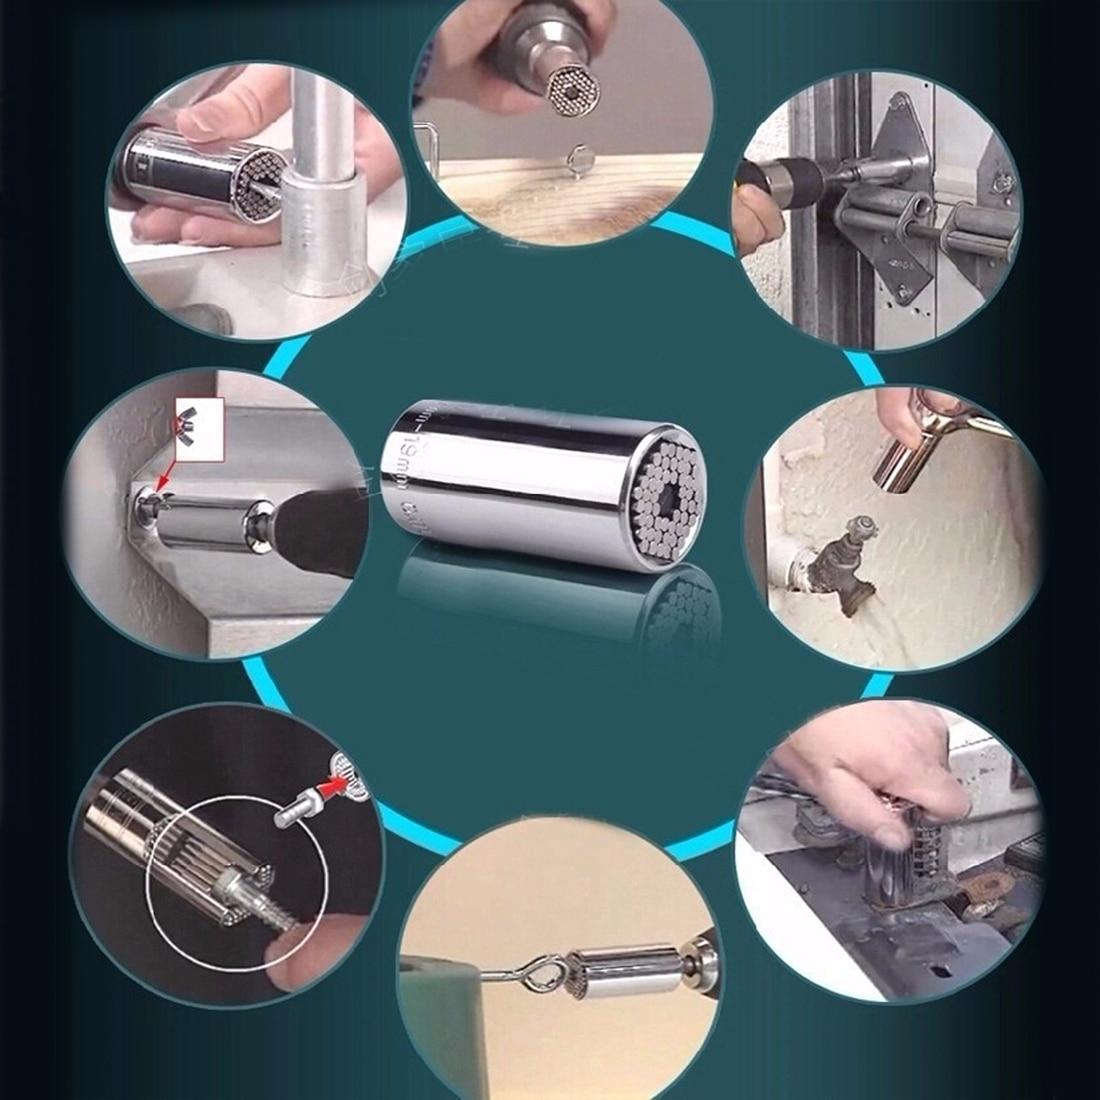 1pcs Universal Multi Hand Tools Torque Wrench Head Set Socket Sleeve 7-19mm Power Drill Ratchet Bushing Spanner Key Magic Grip